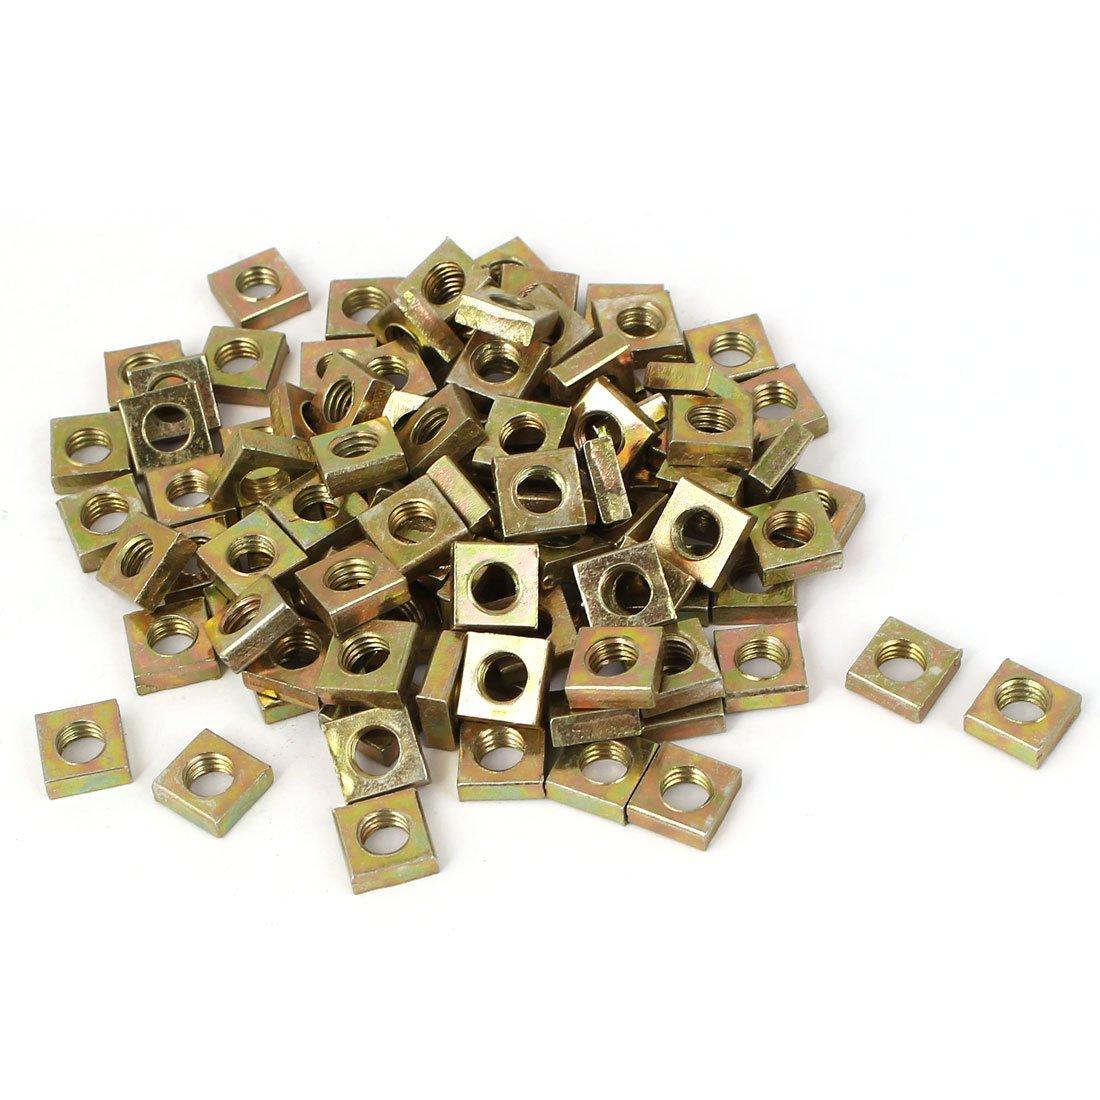 uxcell M3x5.5mmx2mm Zinc Plated Square Nuts Bronze Tone 100pcs